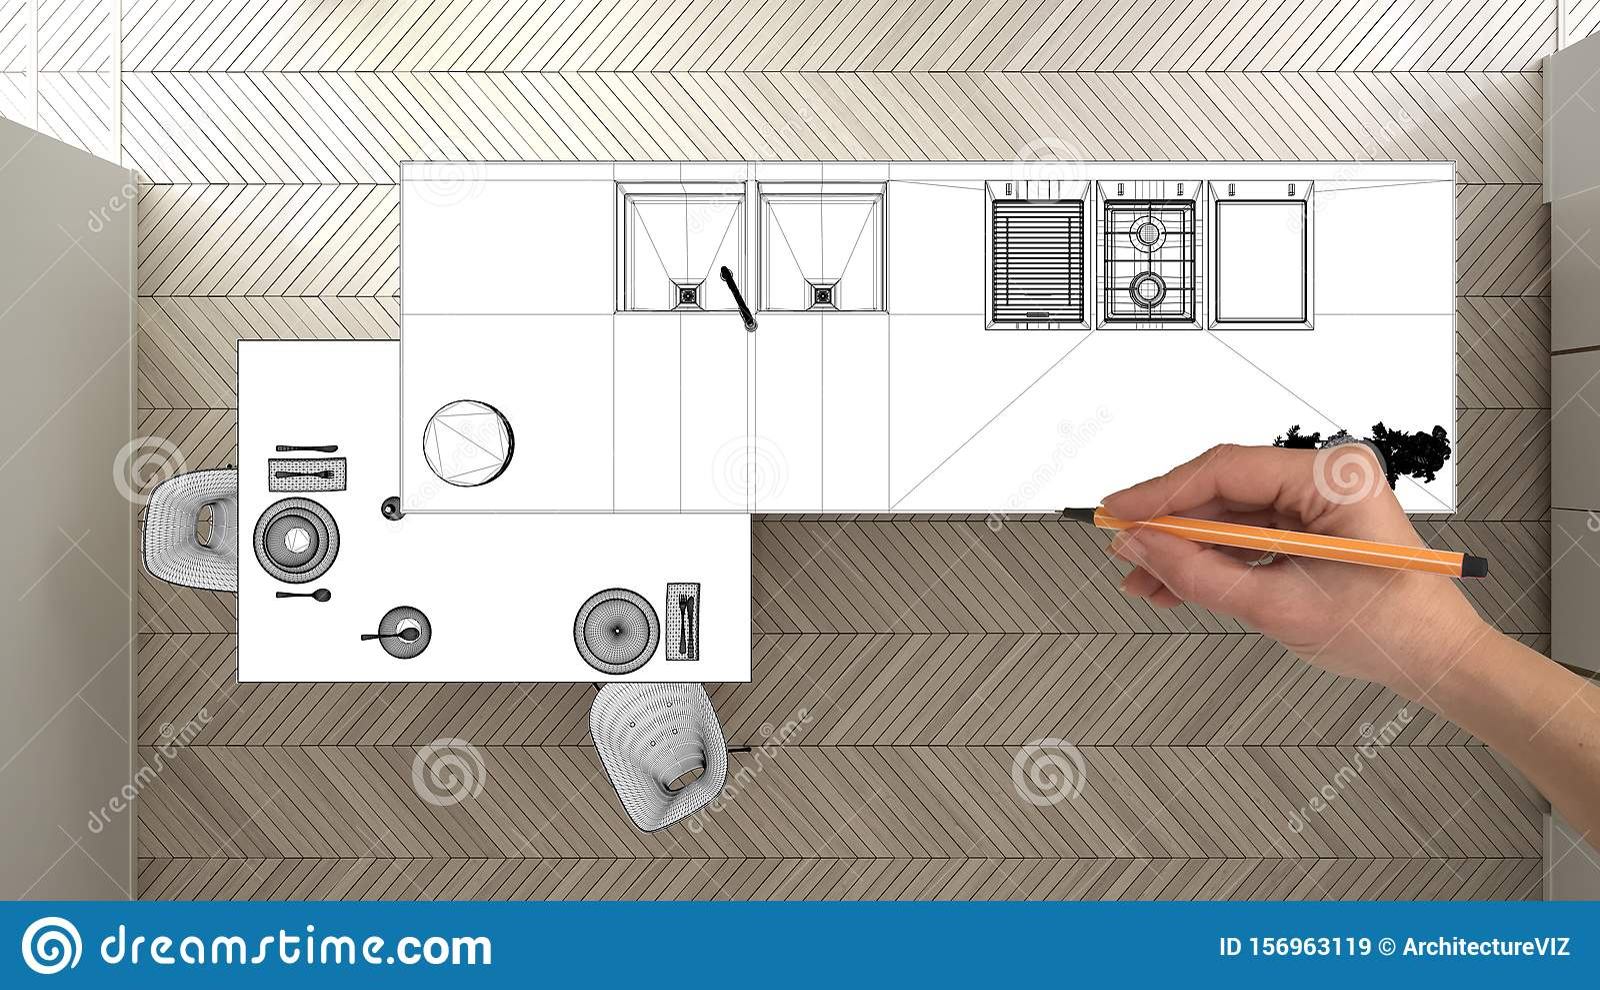 Unfinished Project Under Construction Draft Concept Interior Design Sketch Hand Drawing Blueprint Kitchen Sketch In Real Stock Illustration Illustration Of Model Home 156963119